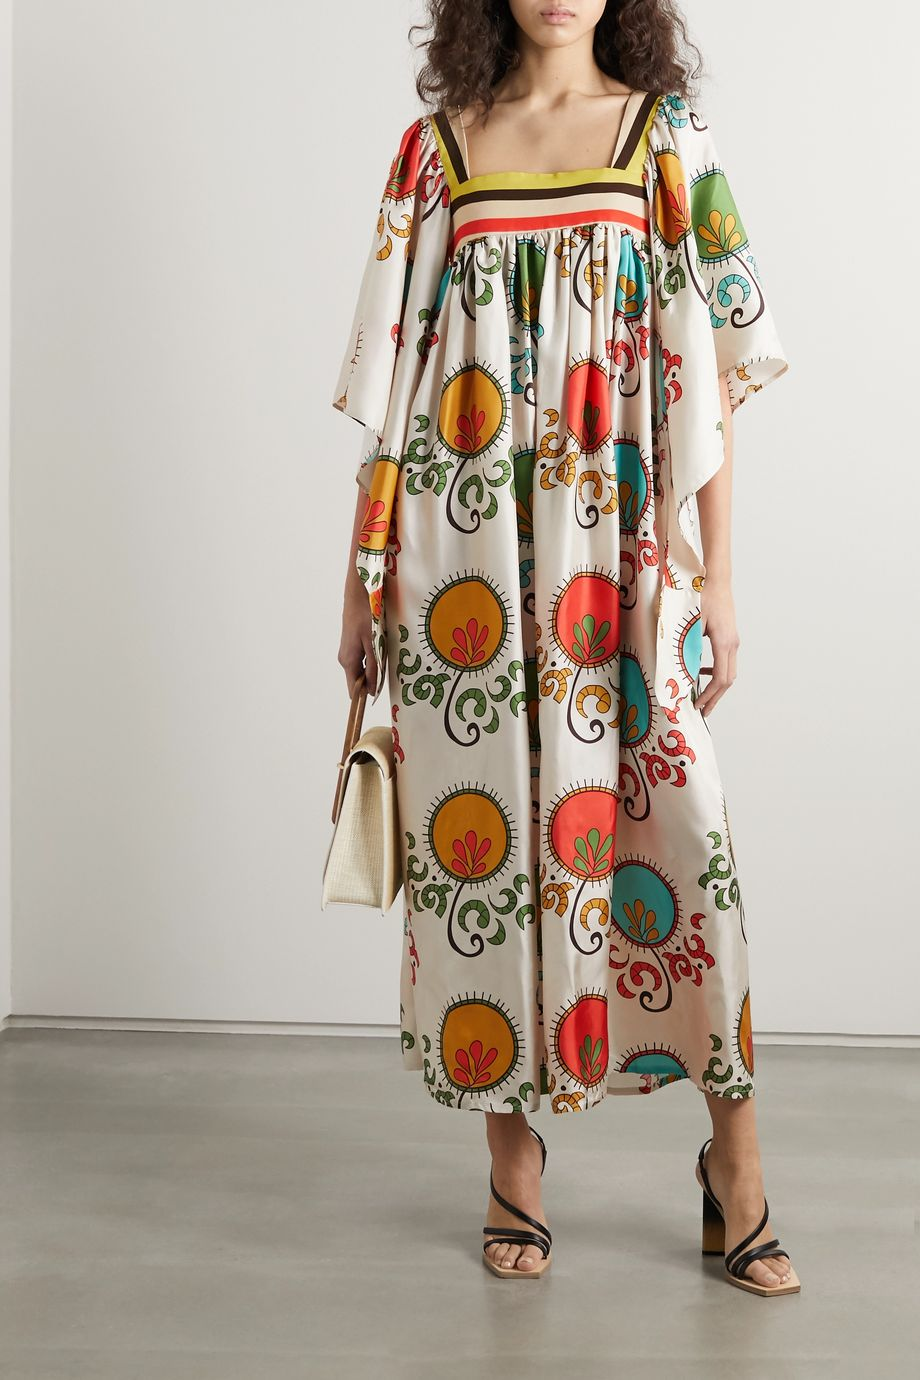 RIANNA + NINA Loukoumi pleated printed silk-twill maxi dress